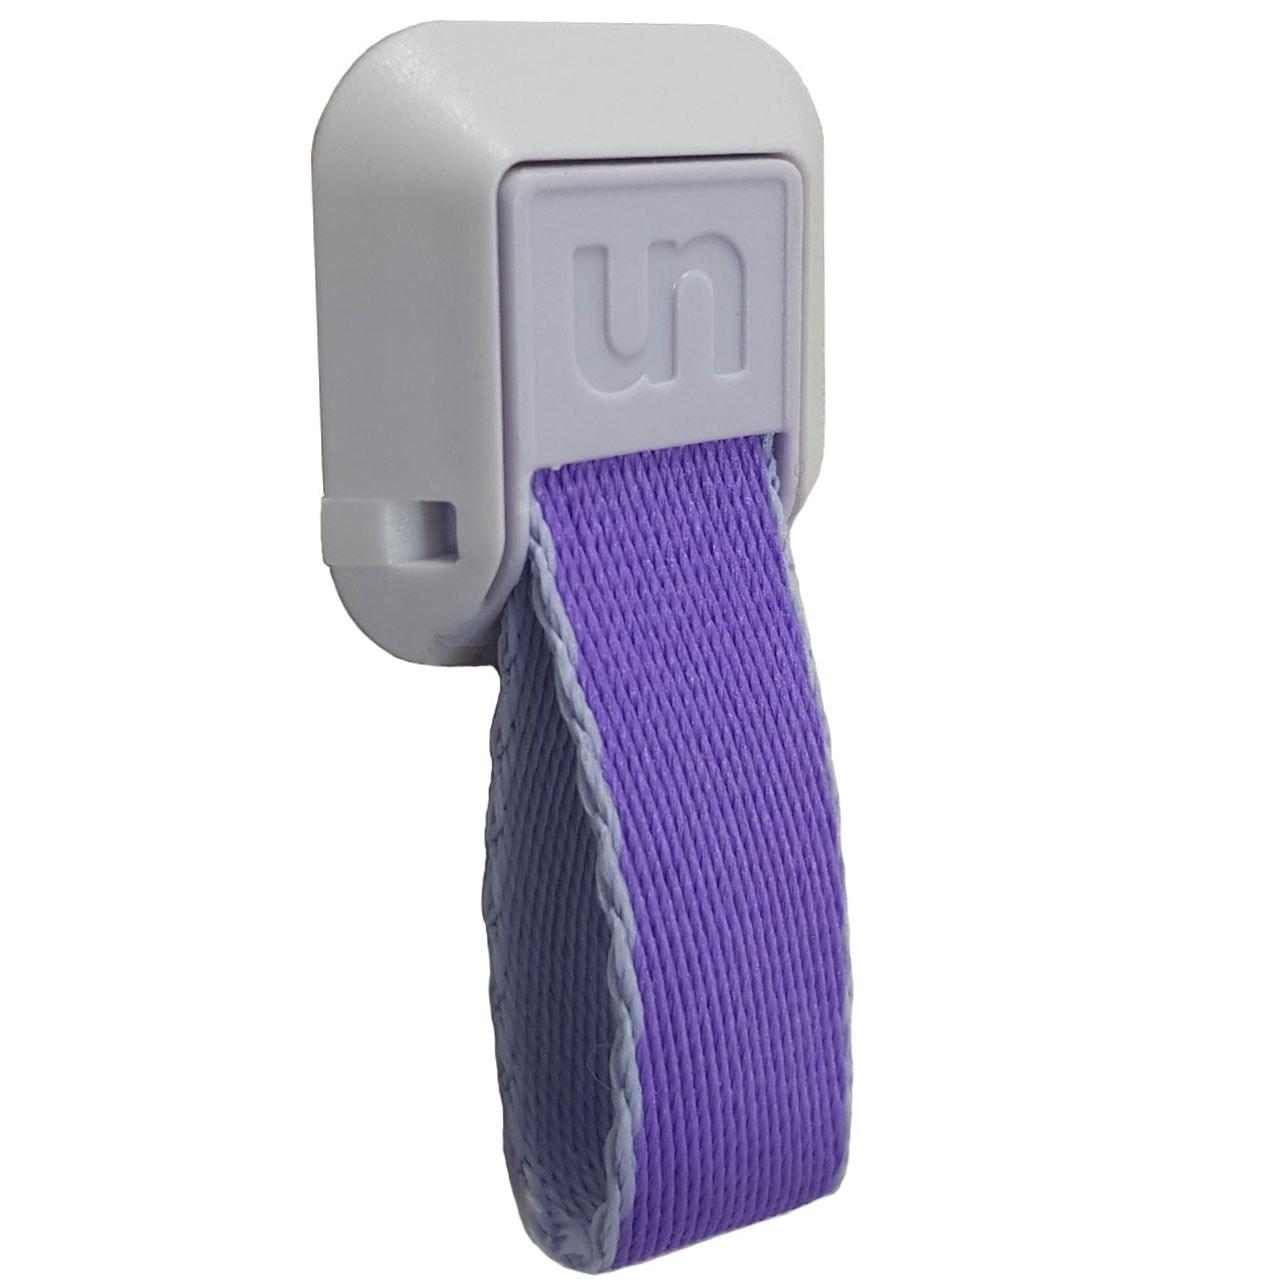 نگهدارنده گوشی موبایل انگیریپ مدل belt